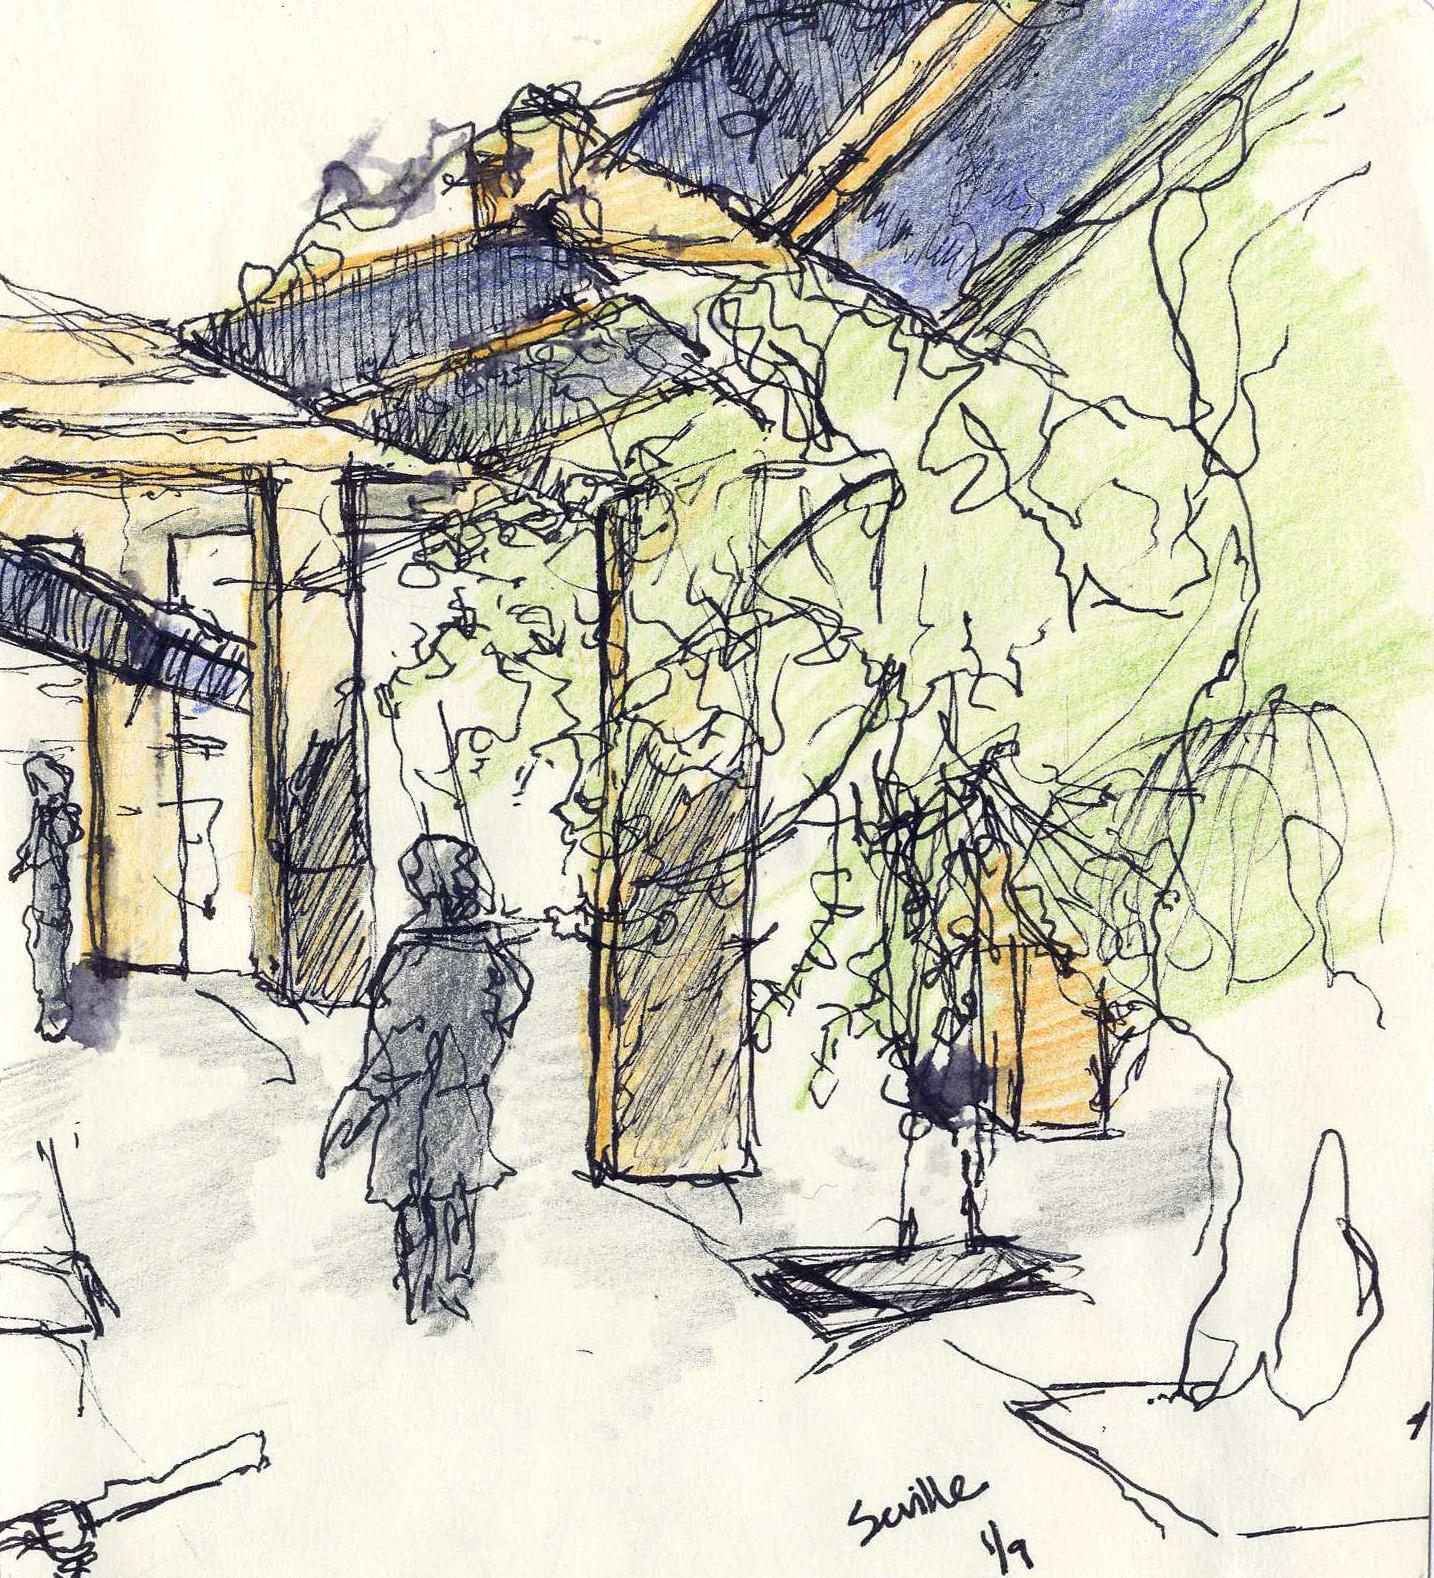 SevilleSketch.jpg